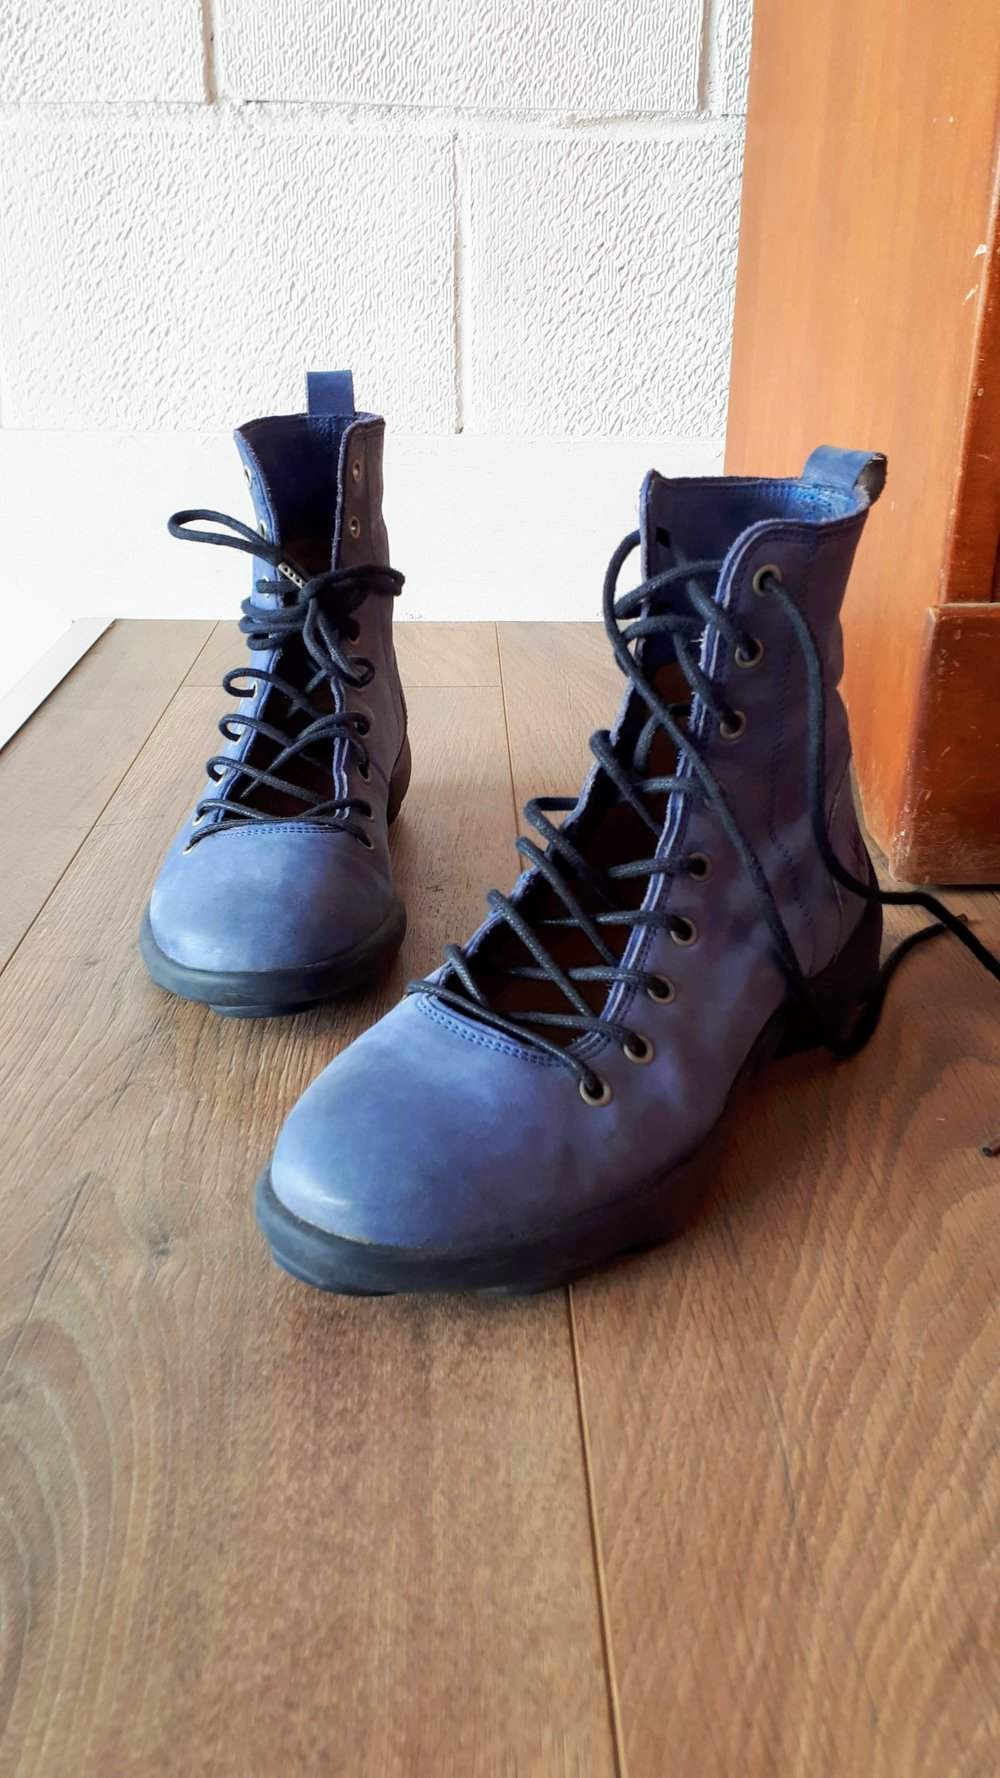 Fluevog boots; S8, $95